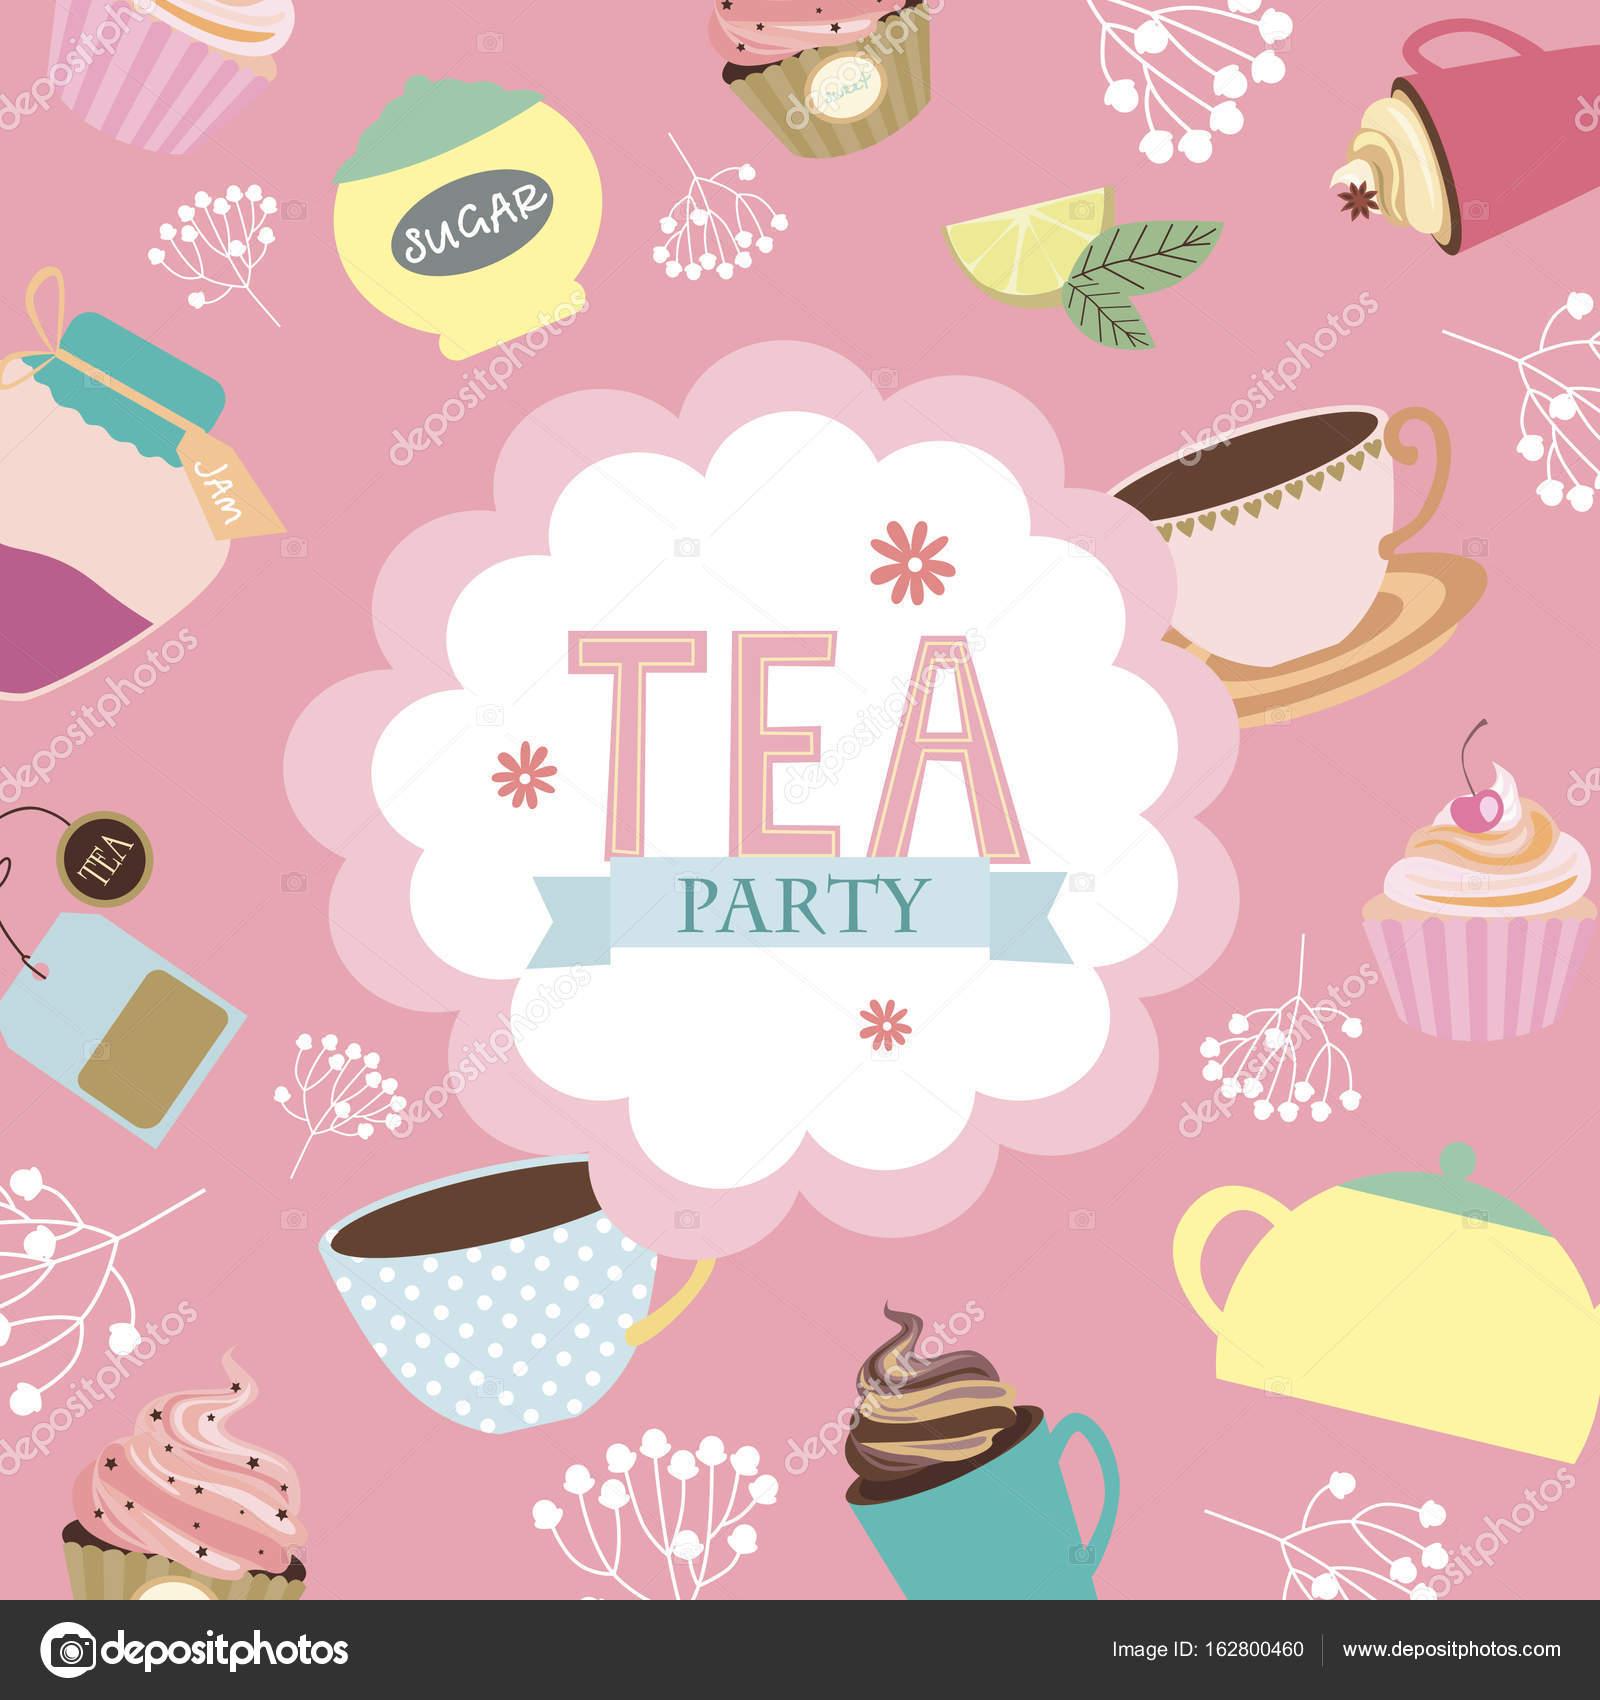 Tea Party Invitation Card Stock Vector C Vissay 162800460